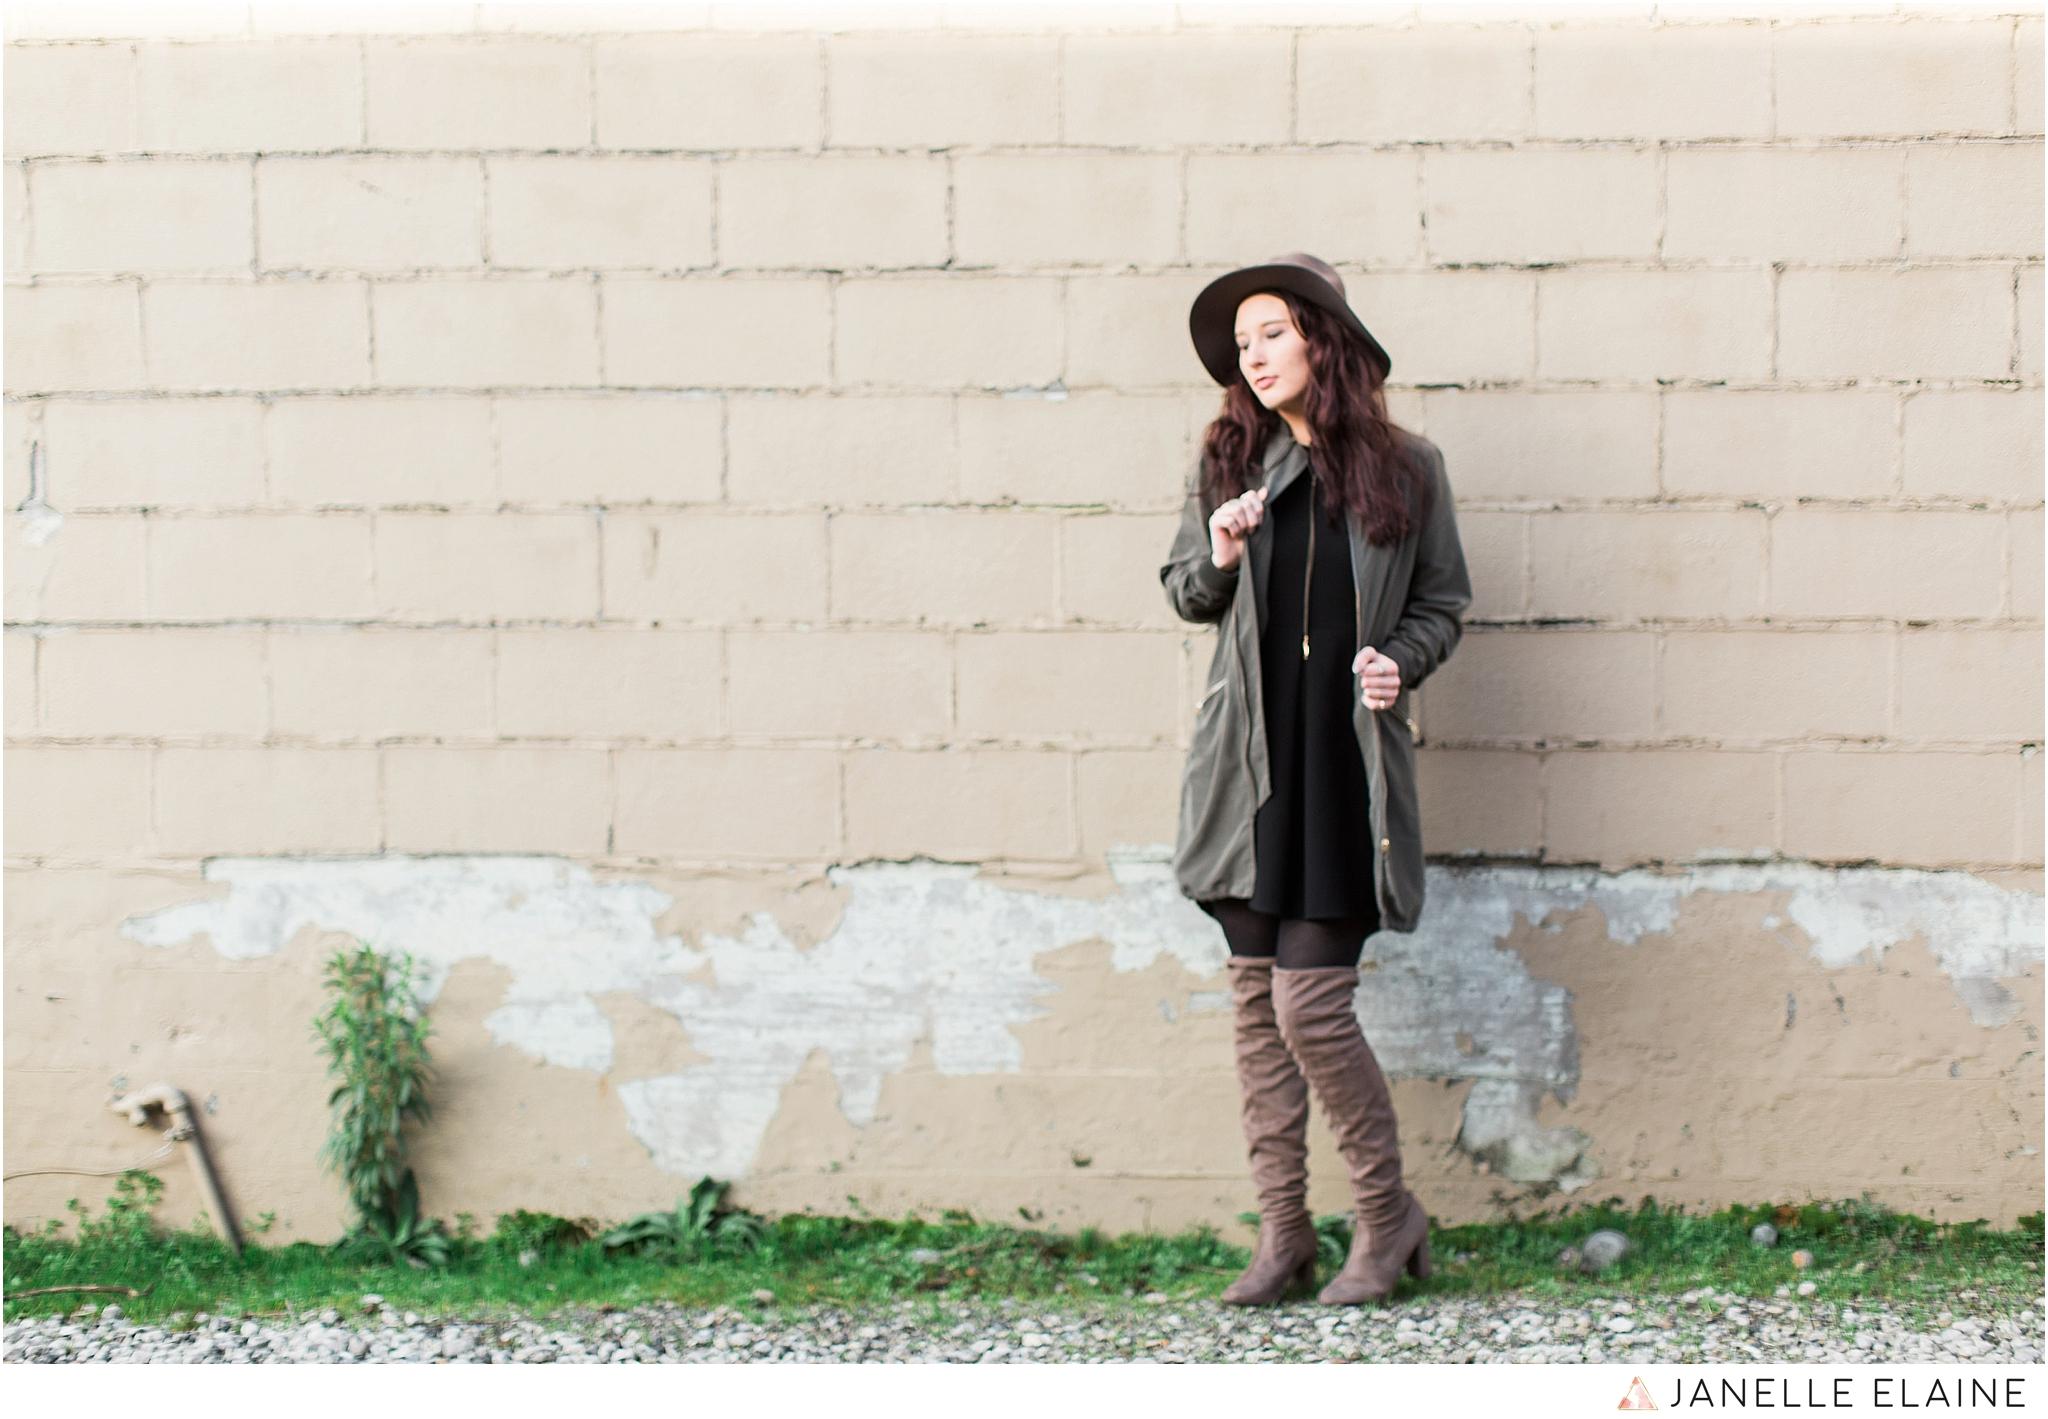 janelle elaine photography-seattle portrait photographer-washington-Hannah-15.jpg